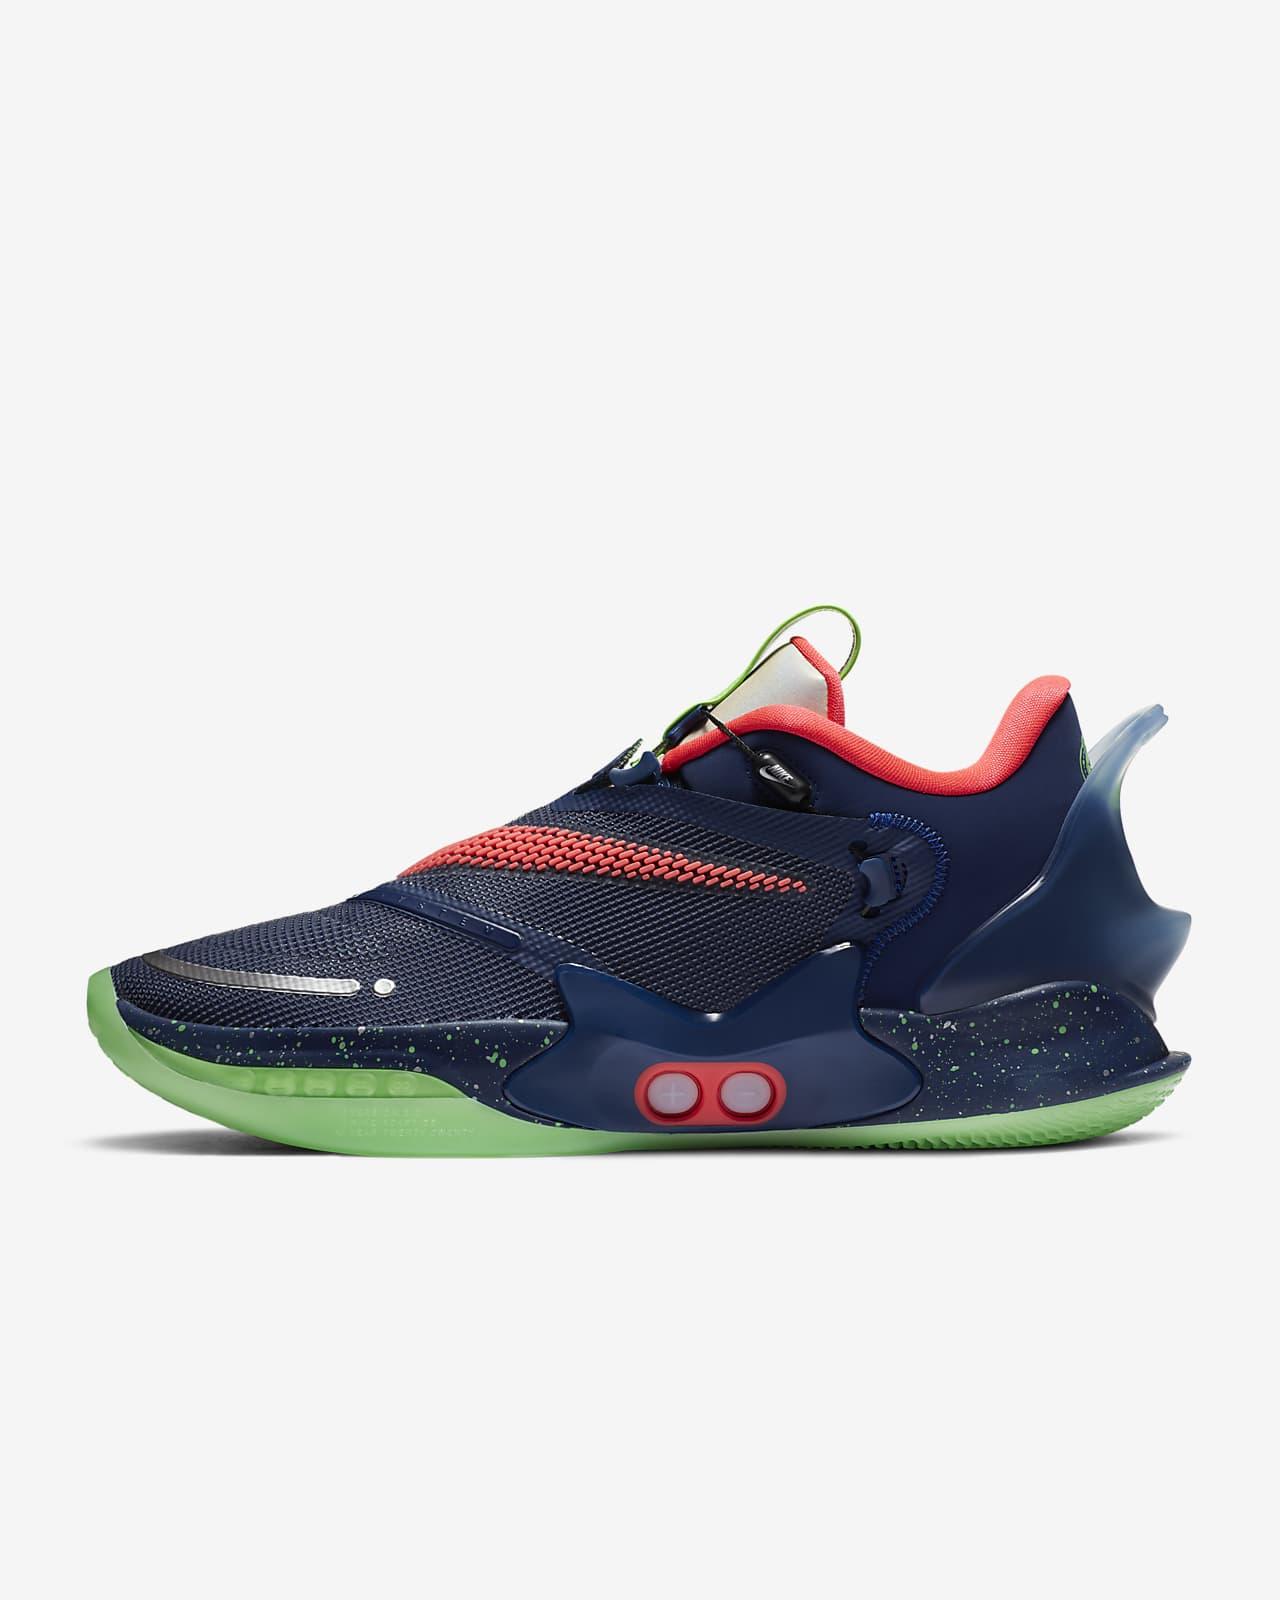 Nike Adapt BB 2.0 GC 男子篮球鞋